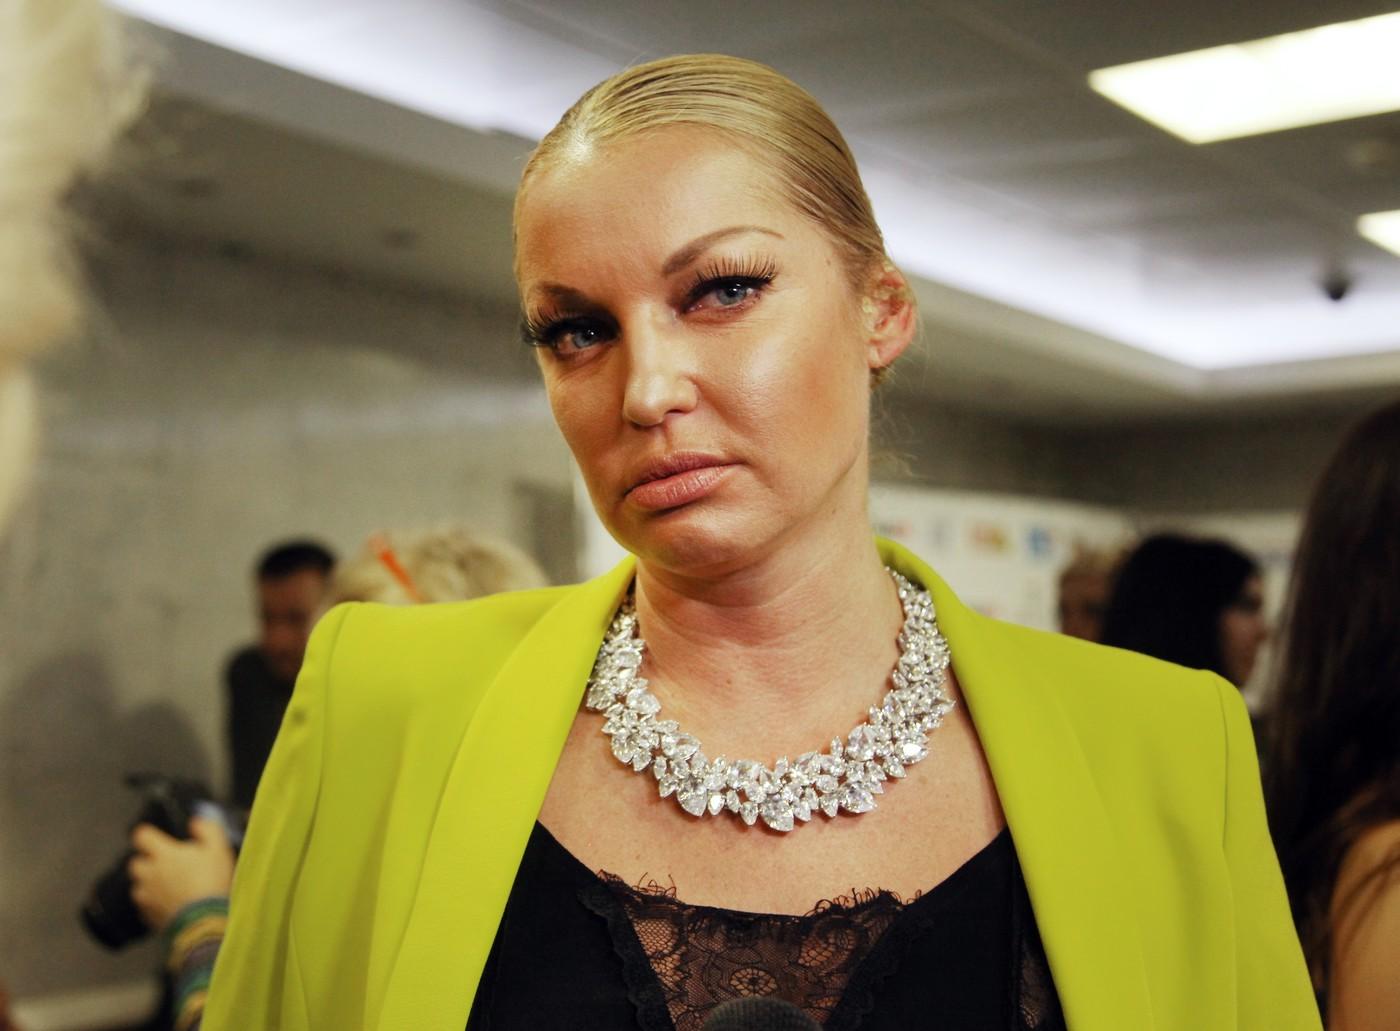 Анастасия Волочкова примерила ультракороткую мини-юбку